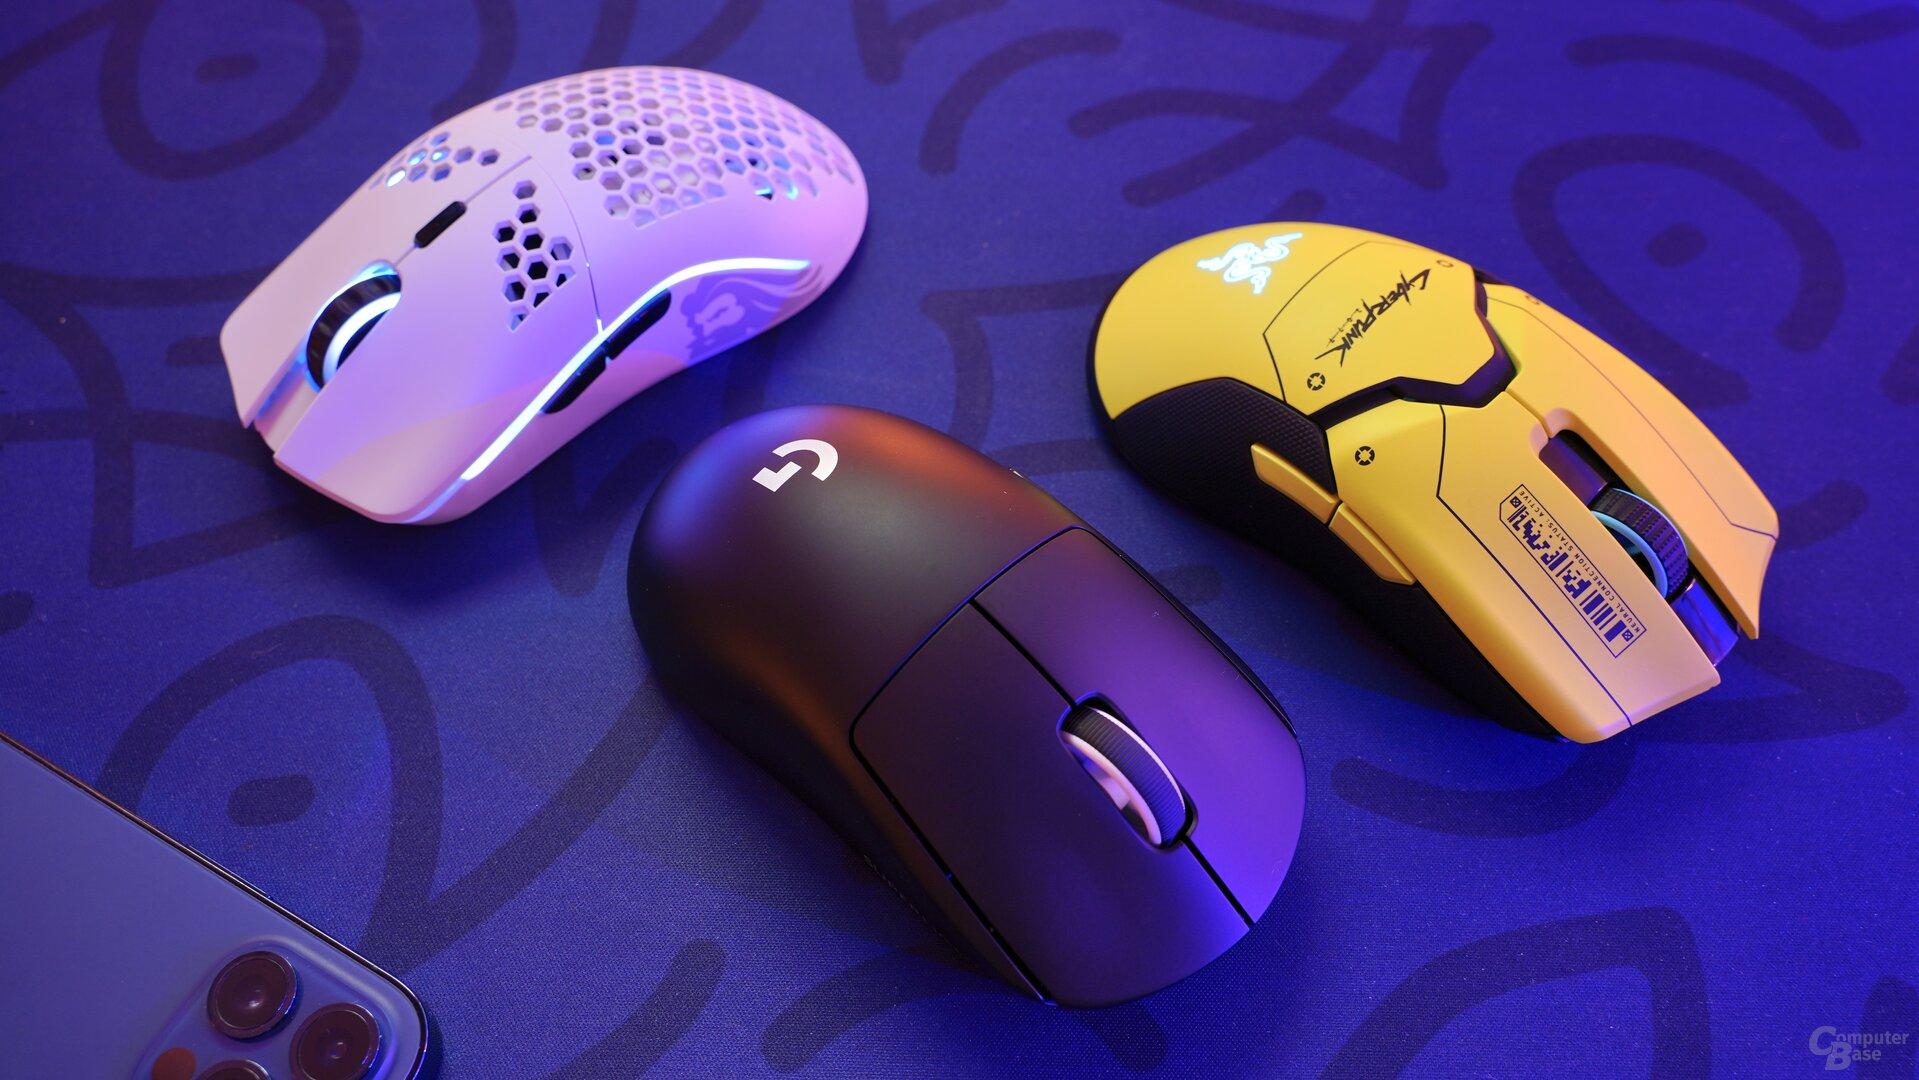 Logitech G Pro X Superlight, Razer Viper Ultimate (Cyberpunk-Edition) & Glorious Model O Wireless